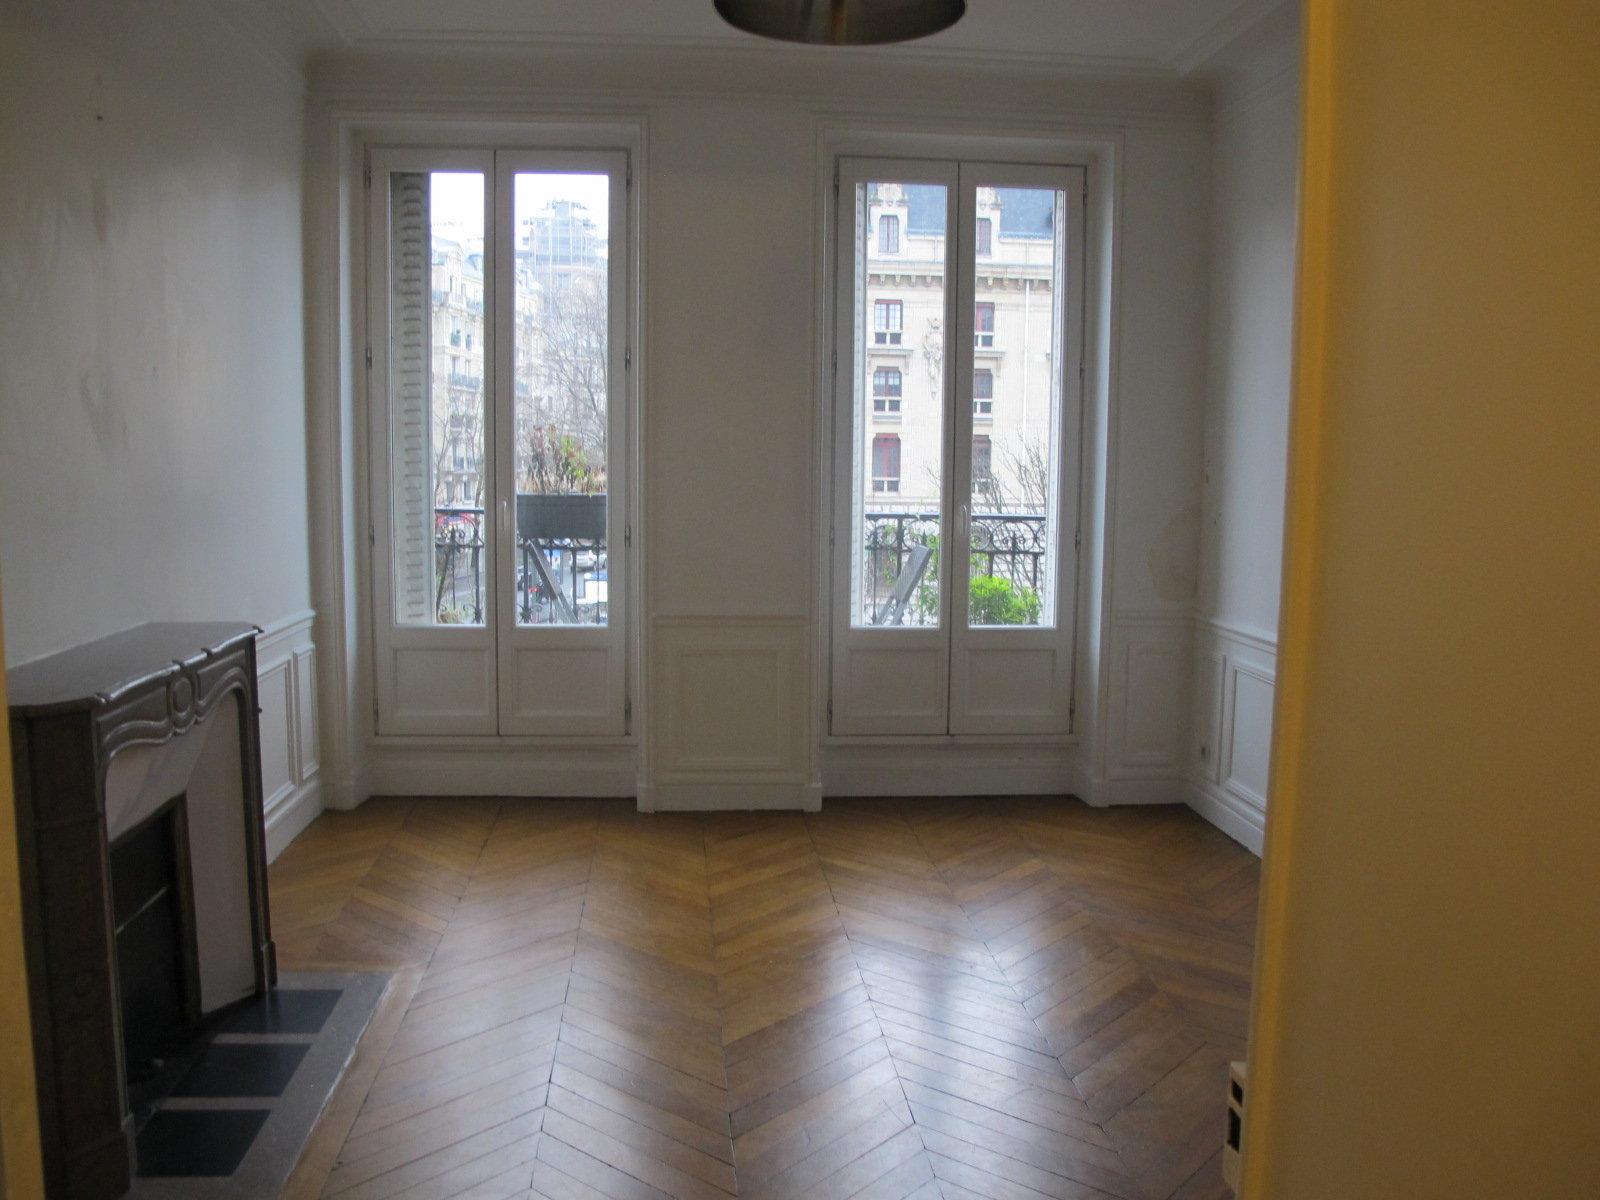 75004 PARIS - SULLY MORLAND